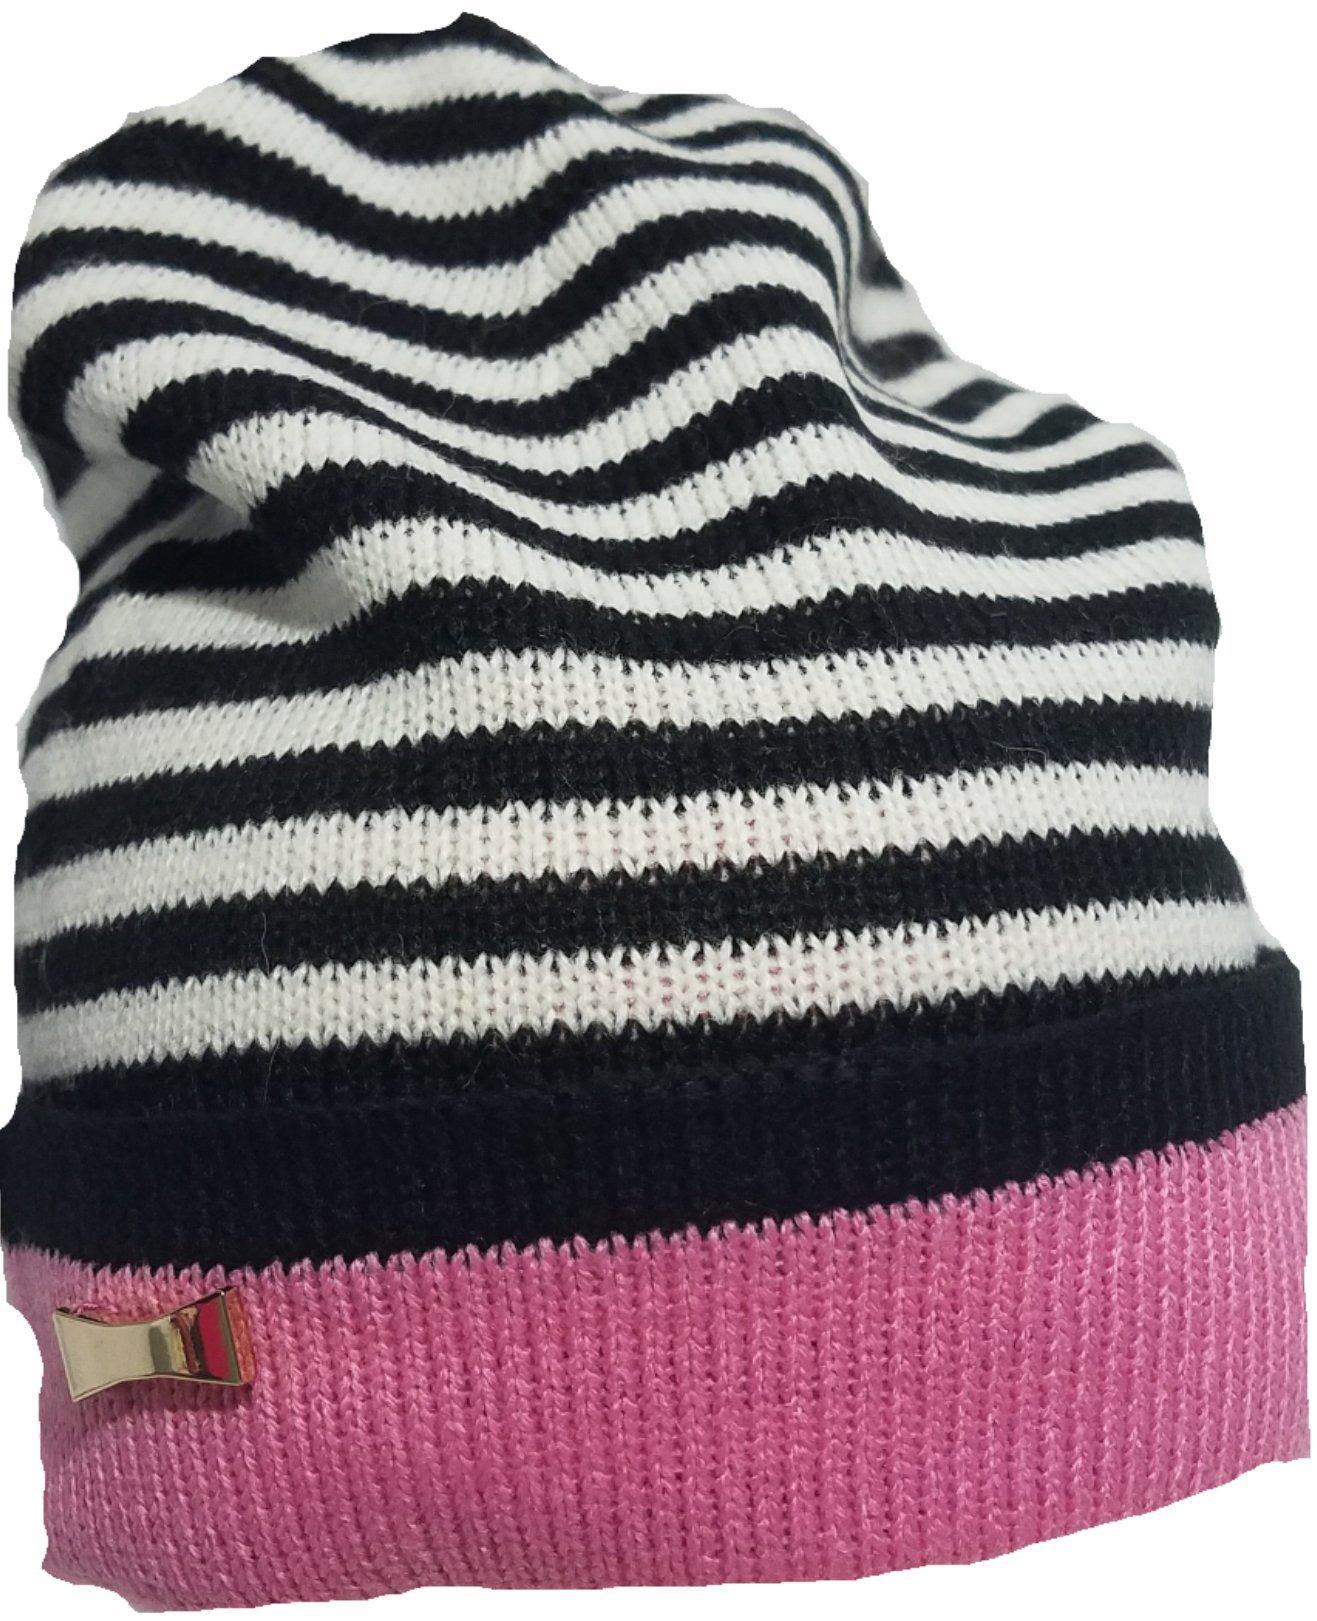 Kate Spade Reversible Stripe Beanie Pink/Black by Kate Spade New York